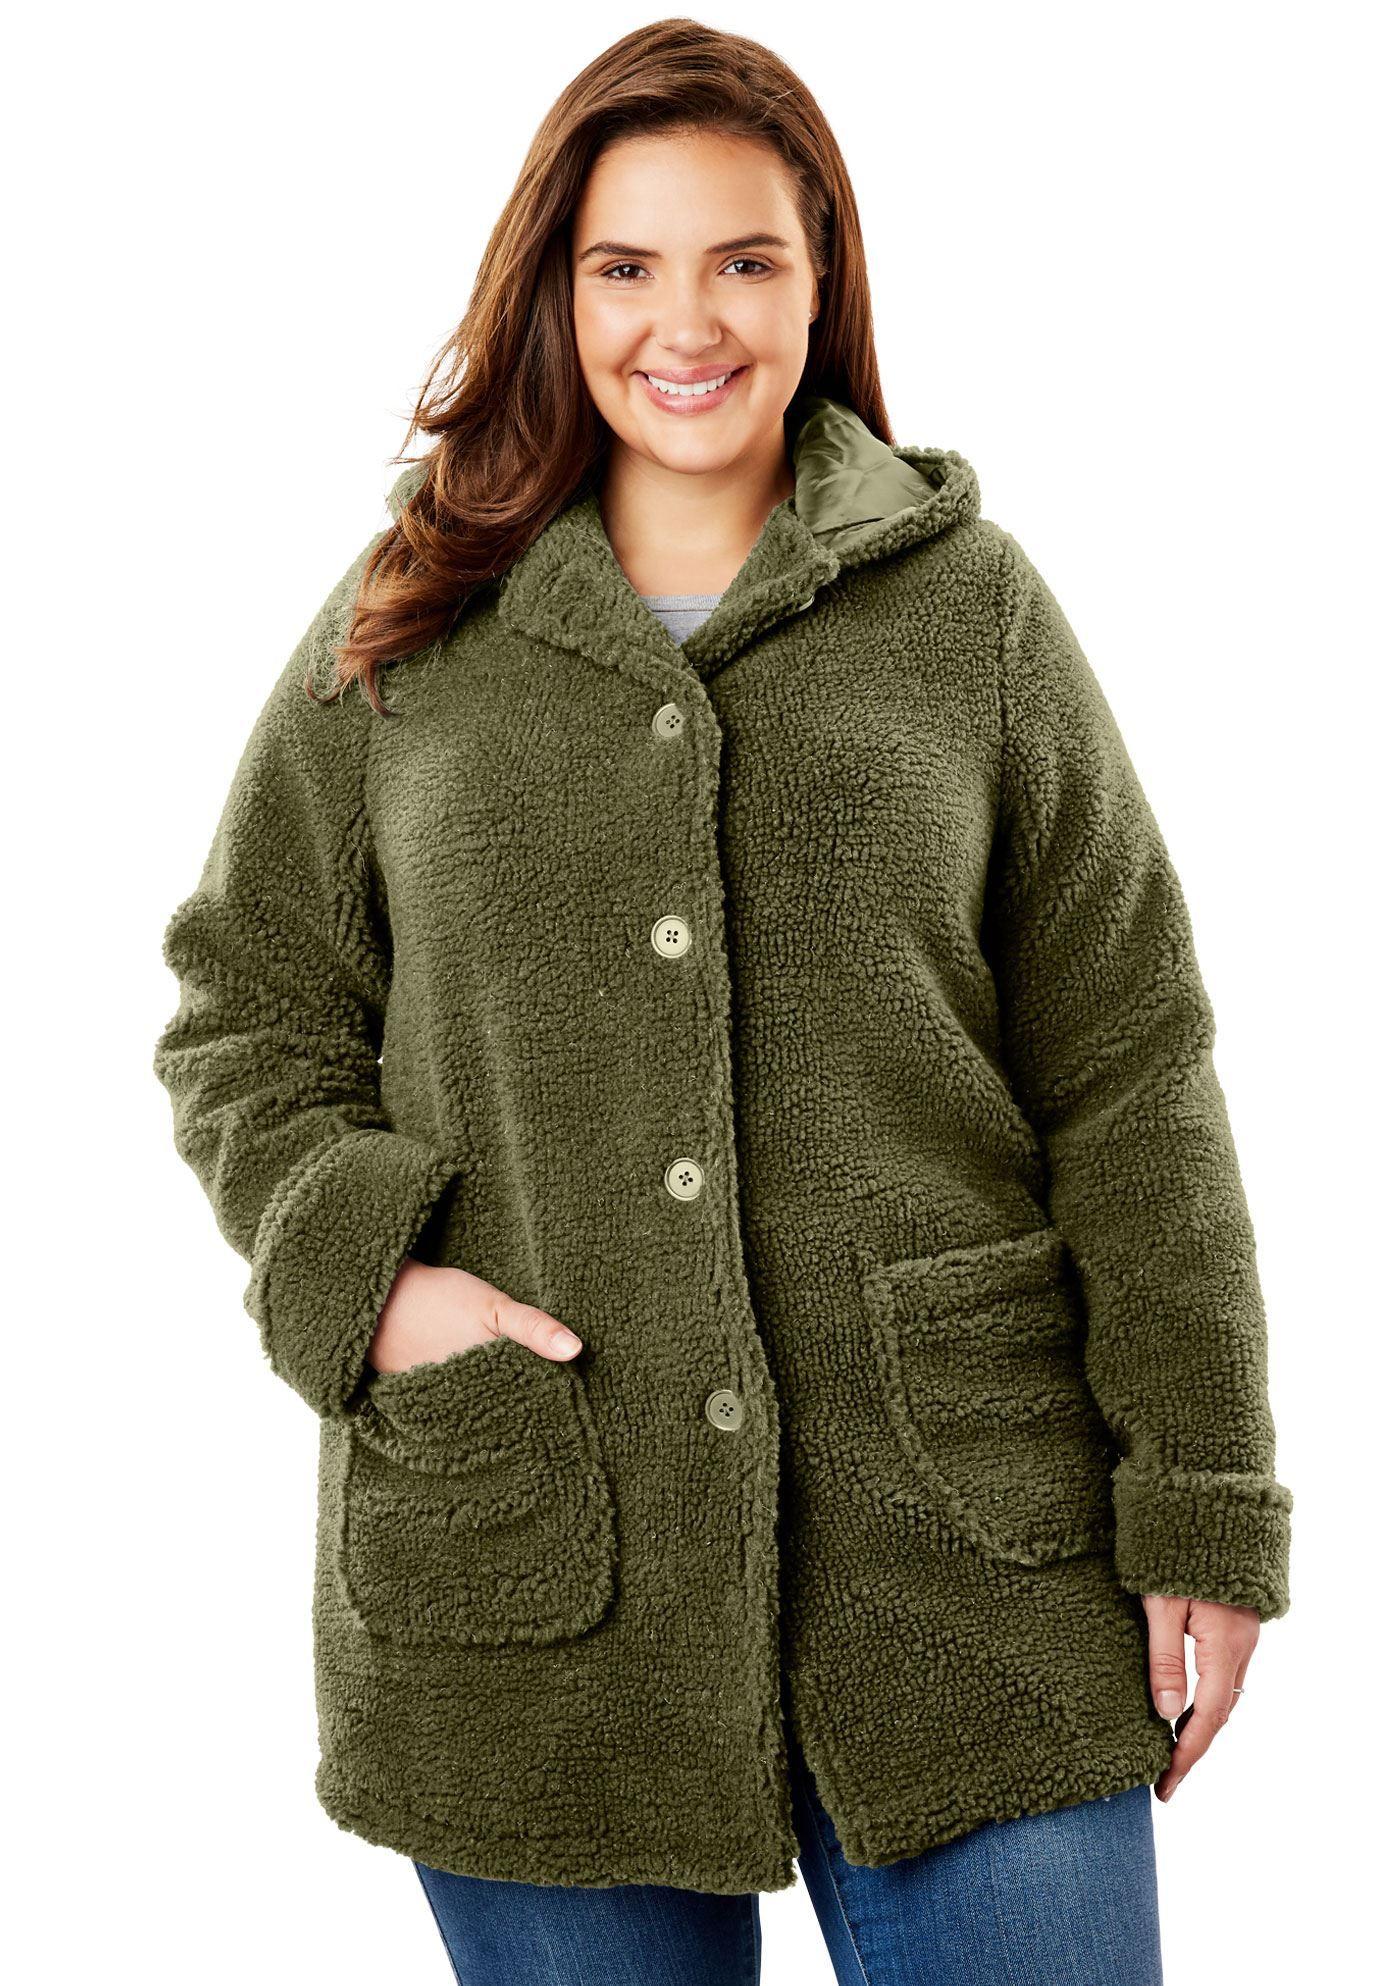 Hooded berber fleece jacket womenus plus size clothing products